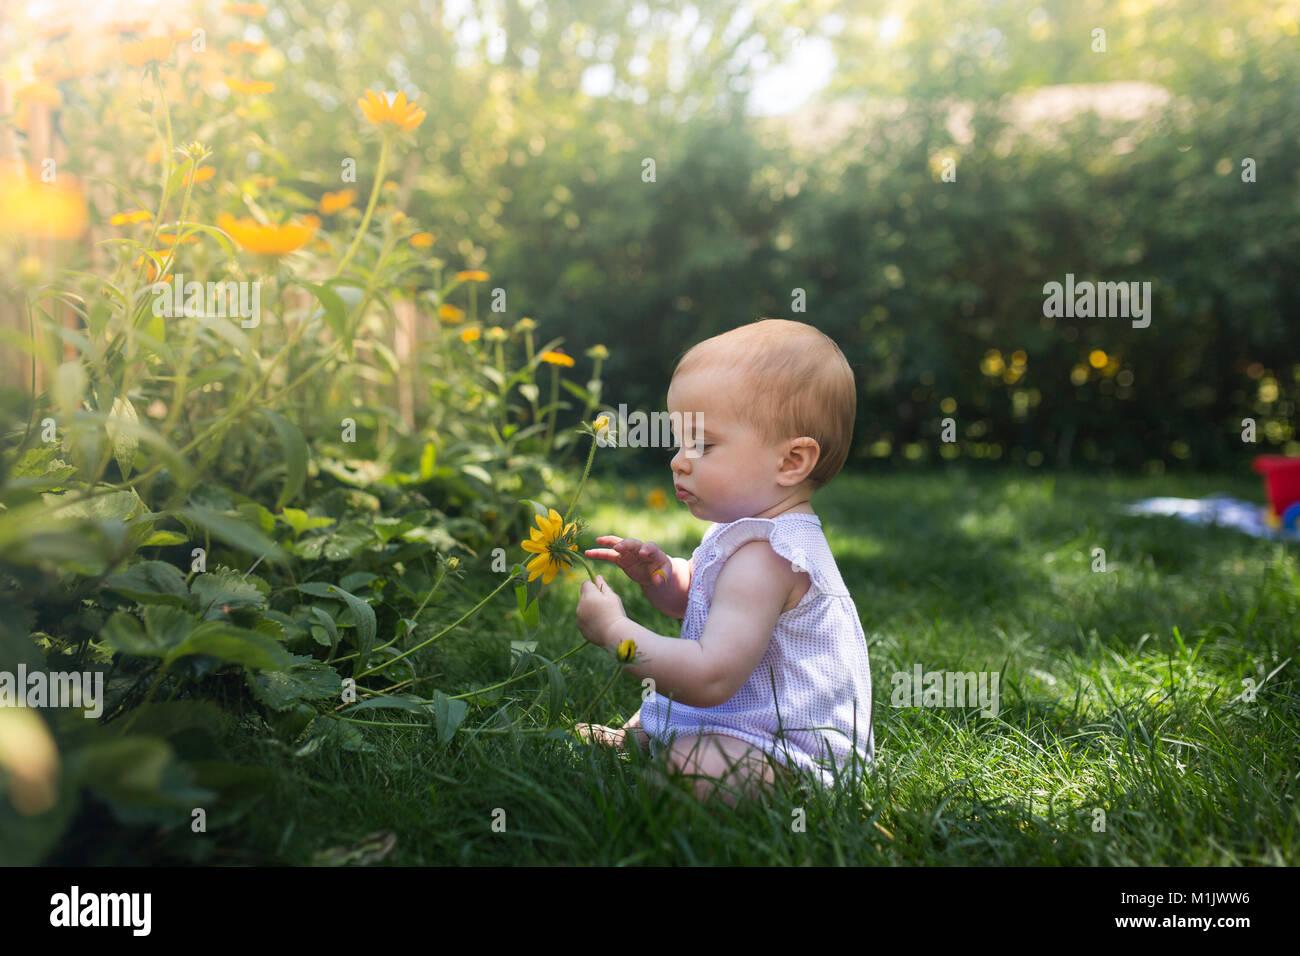 Baby Girl Sitting in Grass Holding Flower - Stock Image